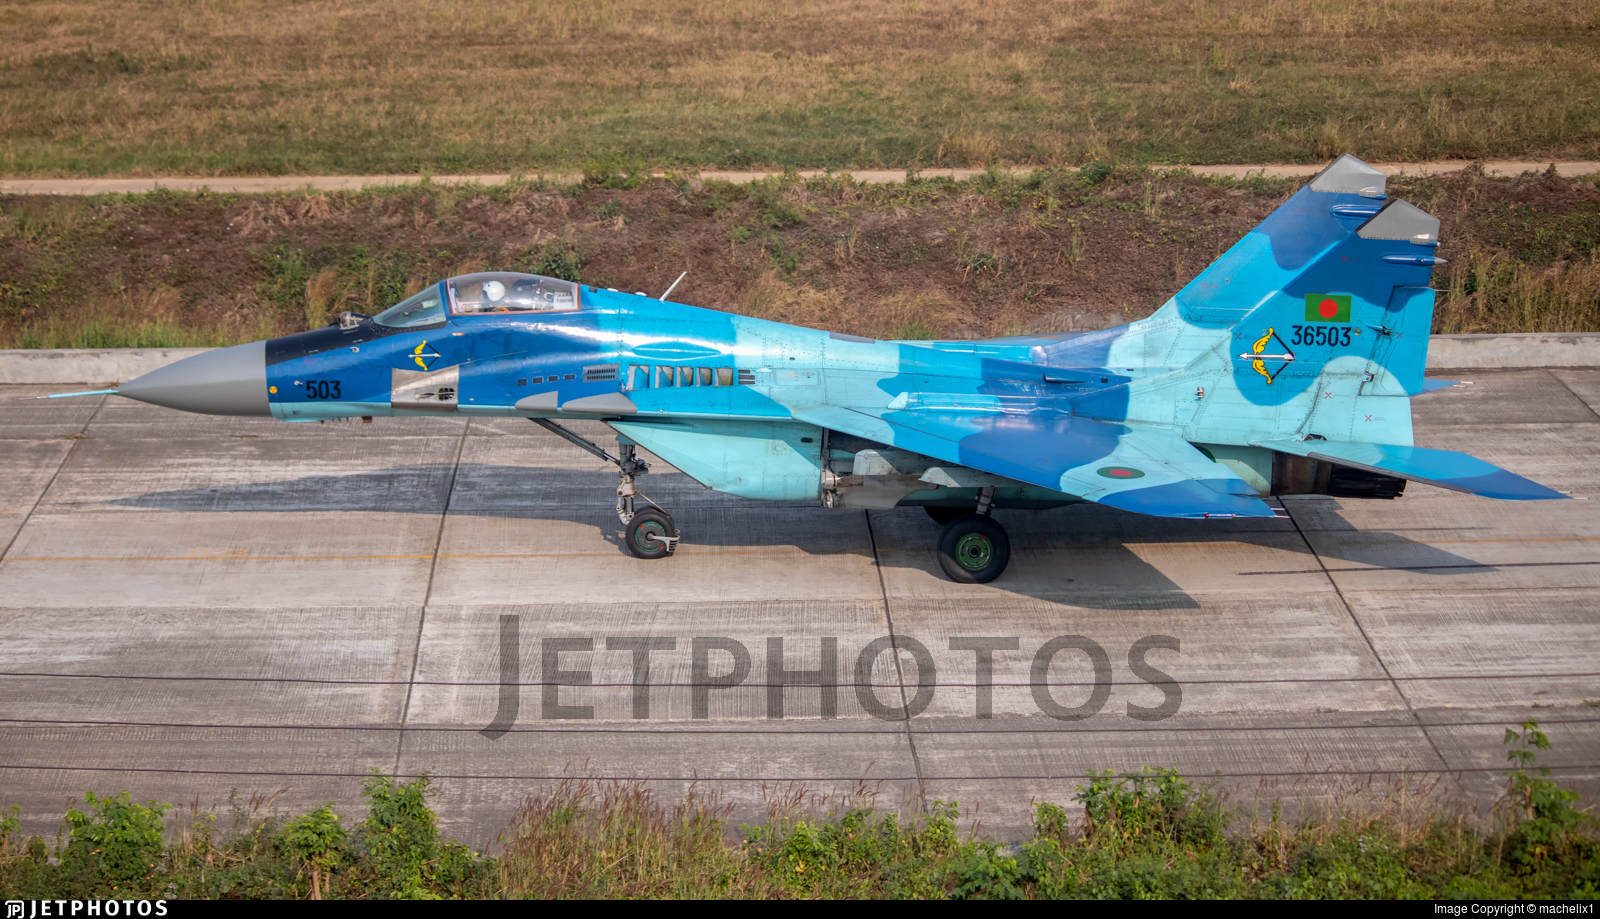 36503 - Mikoyan-Gurevich MiG-29 Fulcrum - Bangladesh - Air Force